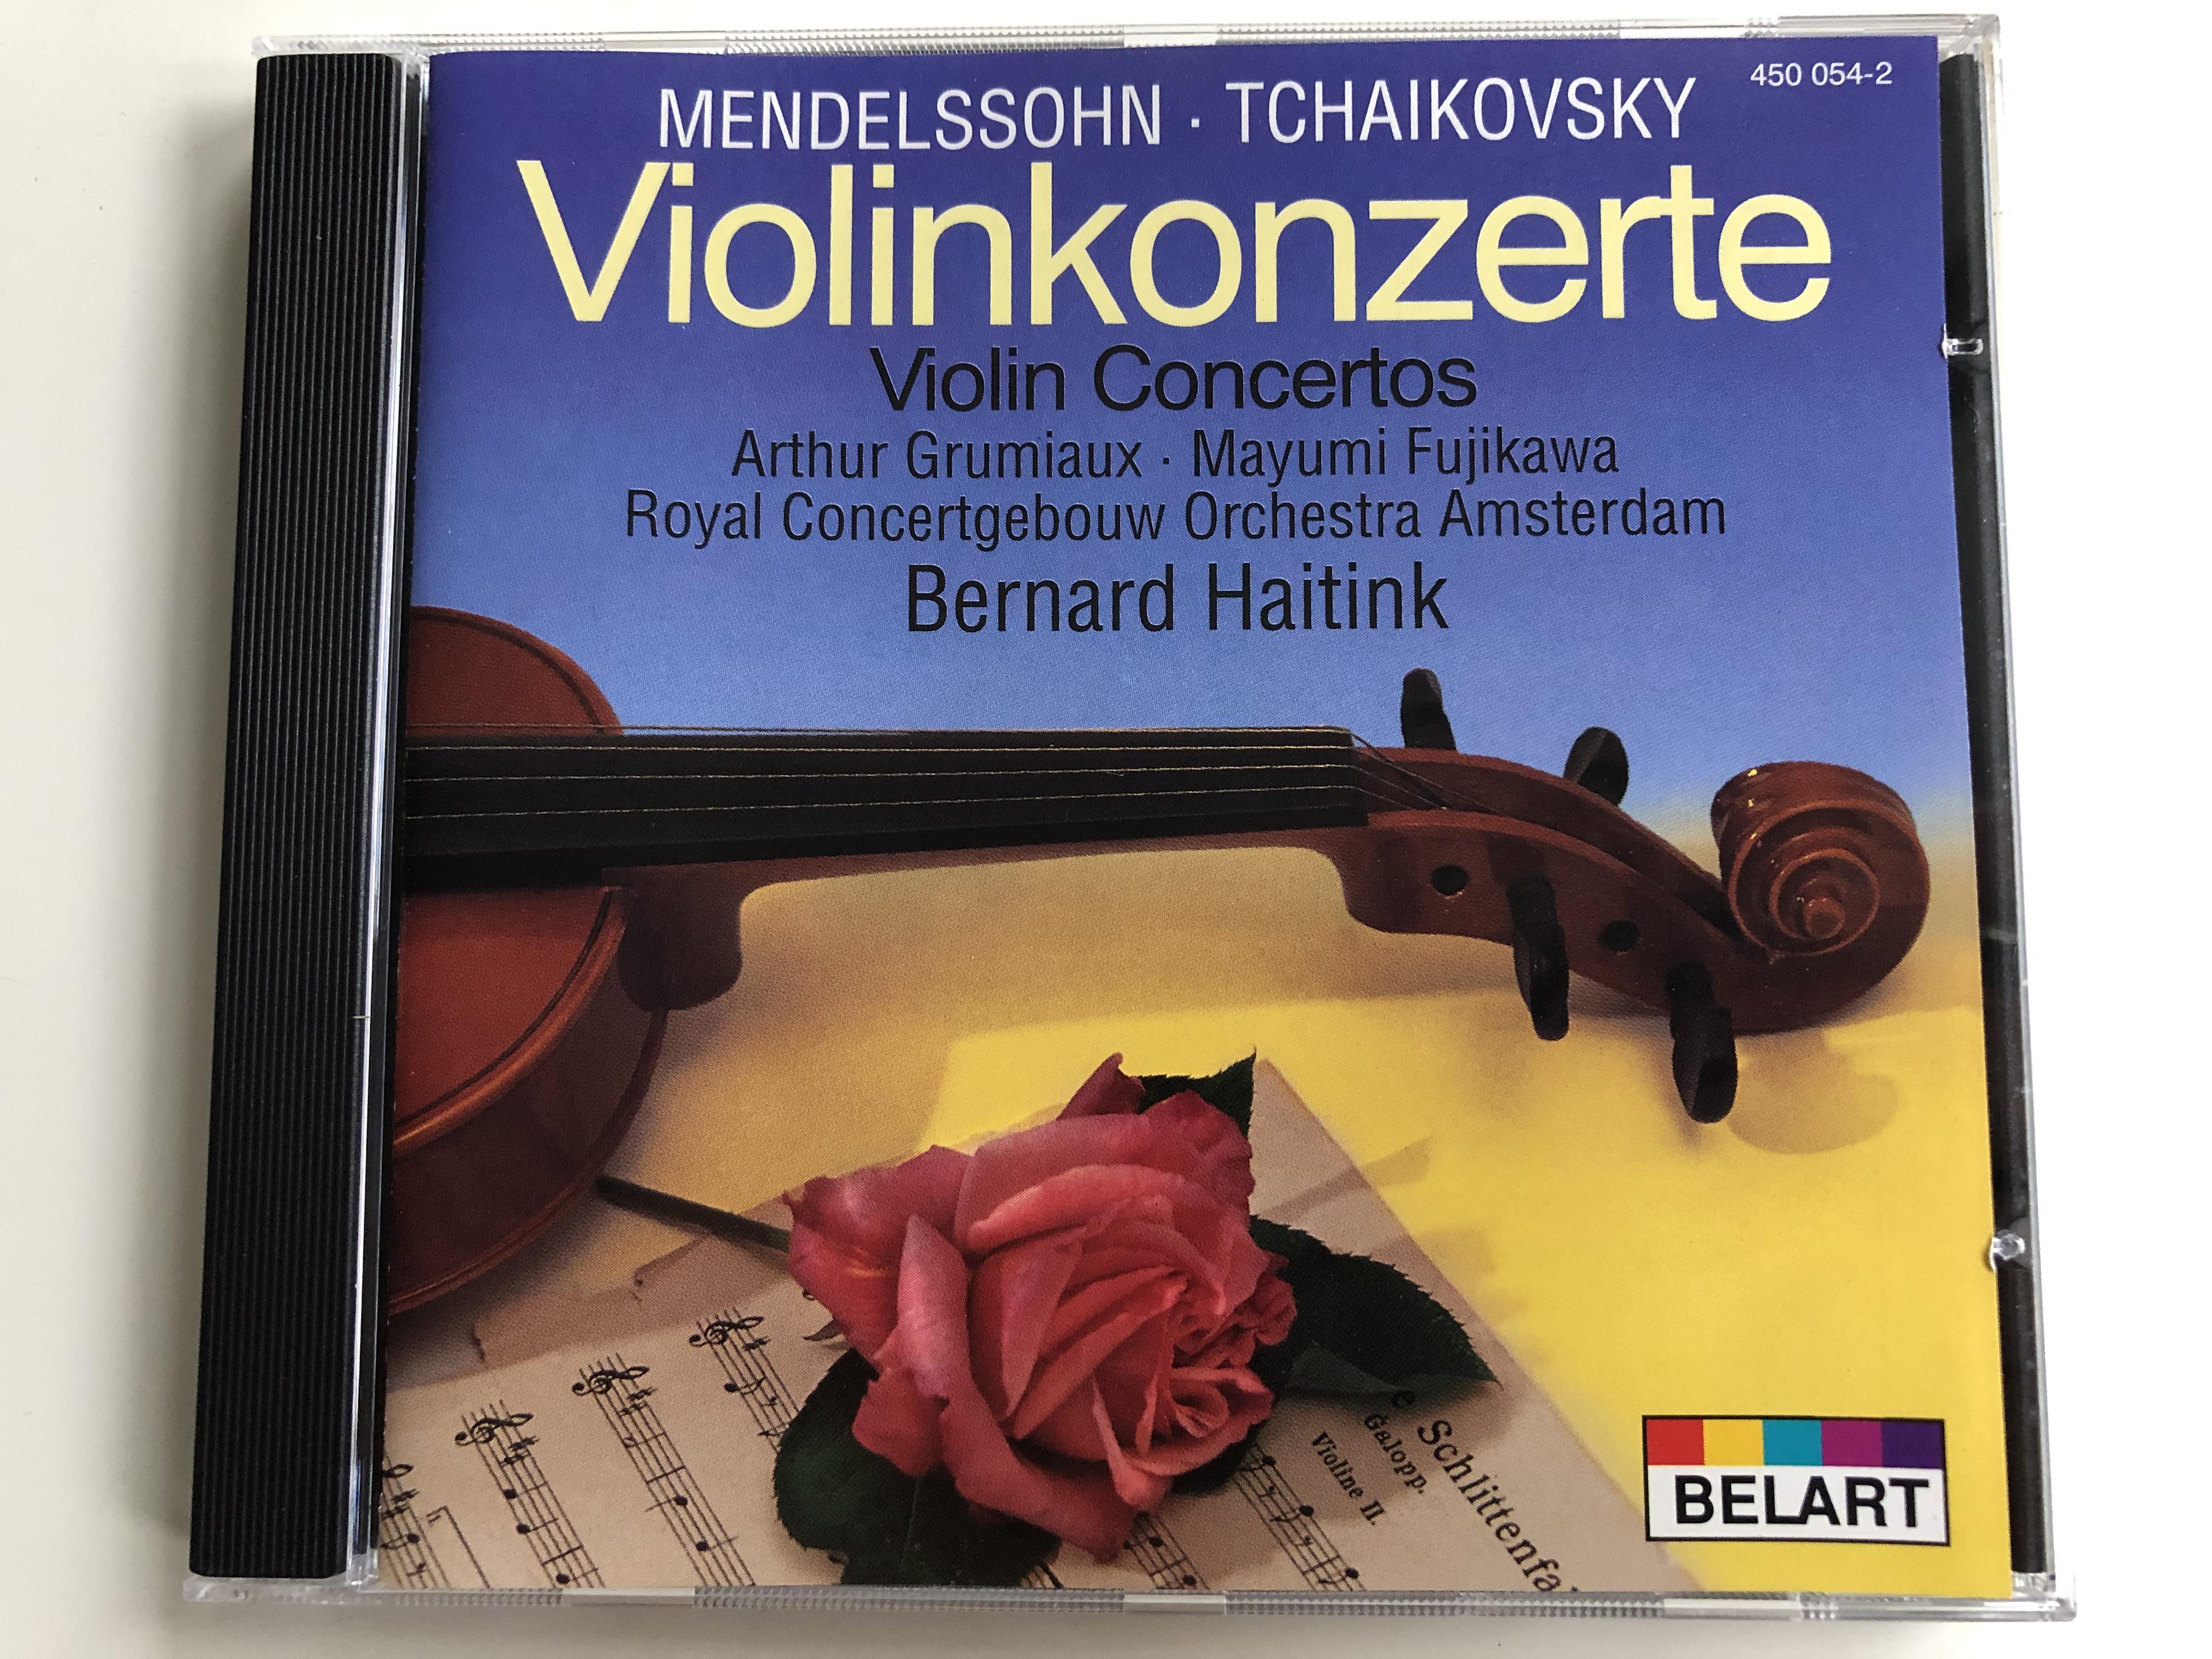 mendelssohn-tchaikovsky-violinkonzerte-violin-concertos-arthur-grumiaux-mayumi-fujikawa-royal-concertgebouw-orchestra-amsterdam-bernard-haitink-belart-audio-cd-stereo-450-054-2-1-.jpg